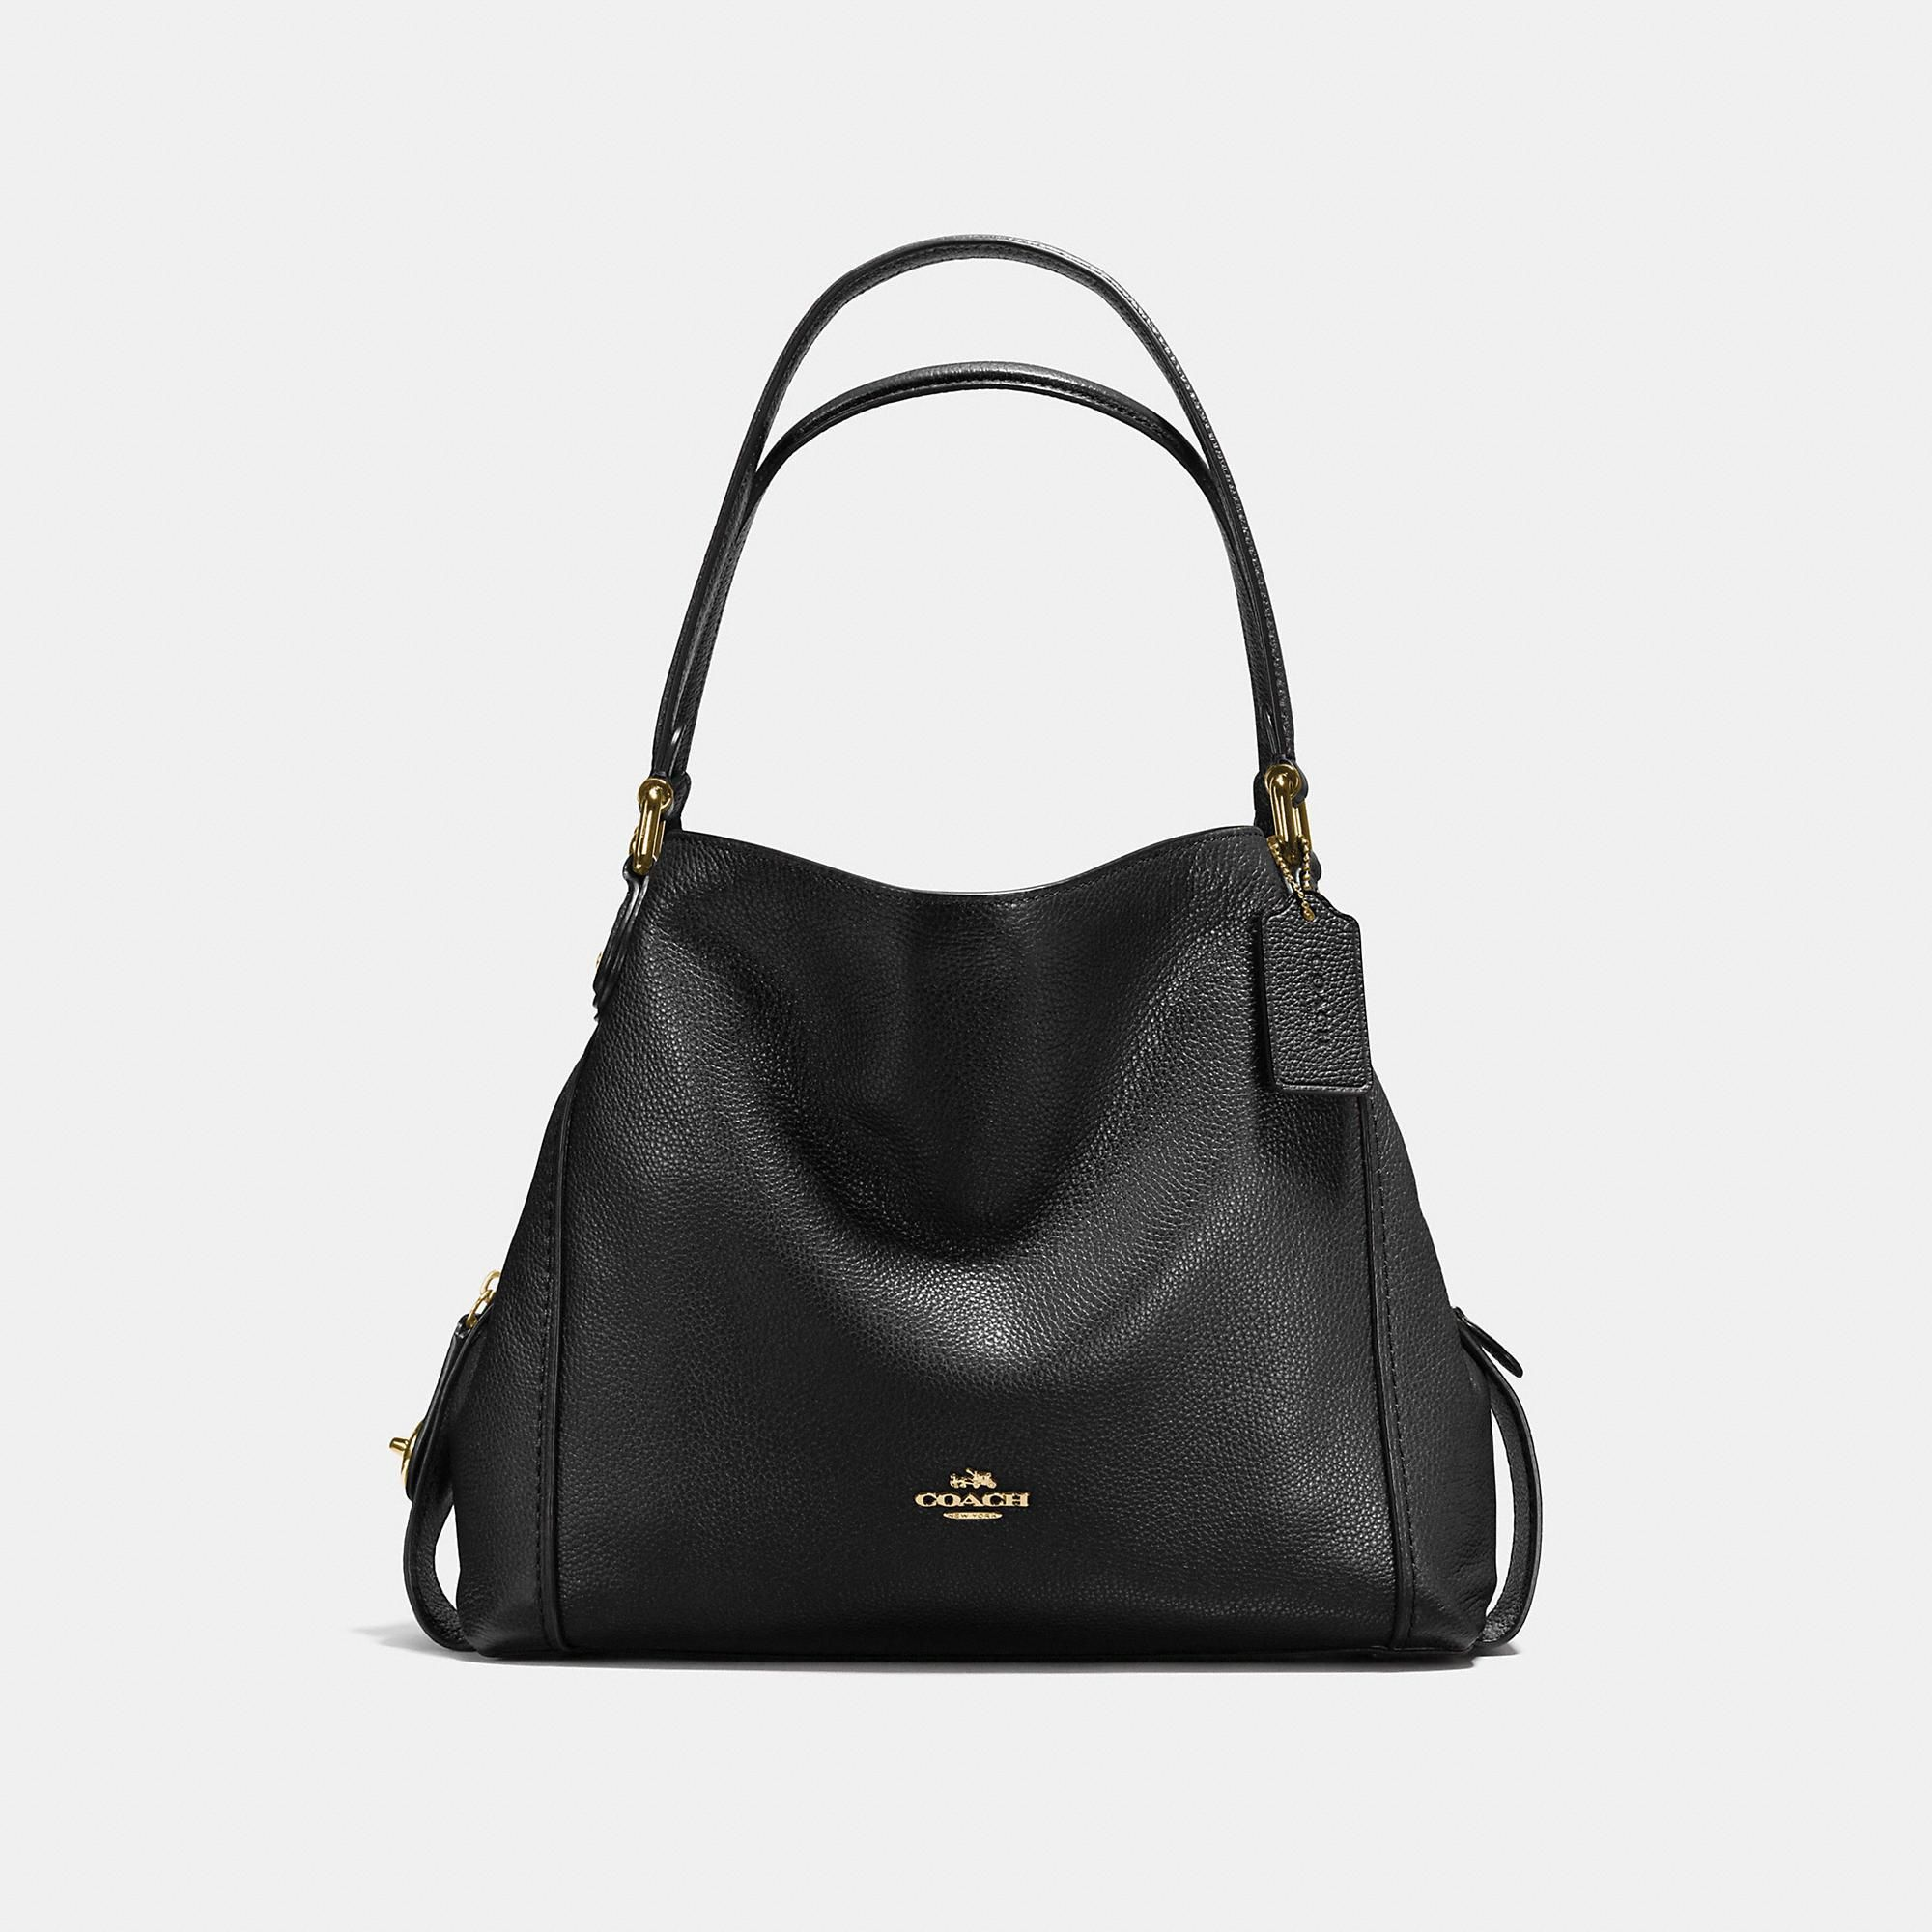 Tote - Polished Pebbled Leather Edie 31 Shoulder Bag Heather Grey - grey - Tote for ladies Coach DAUUf0BN